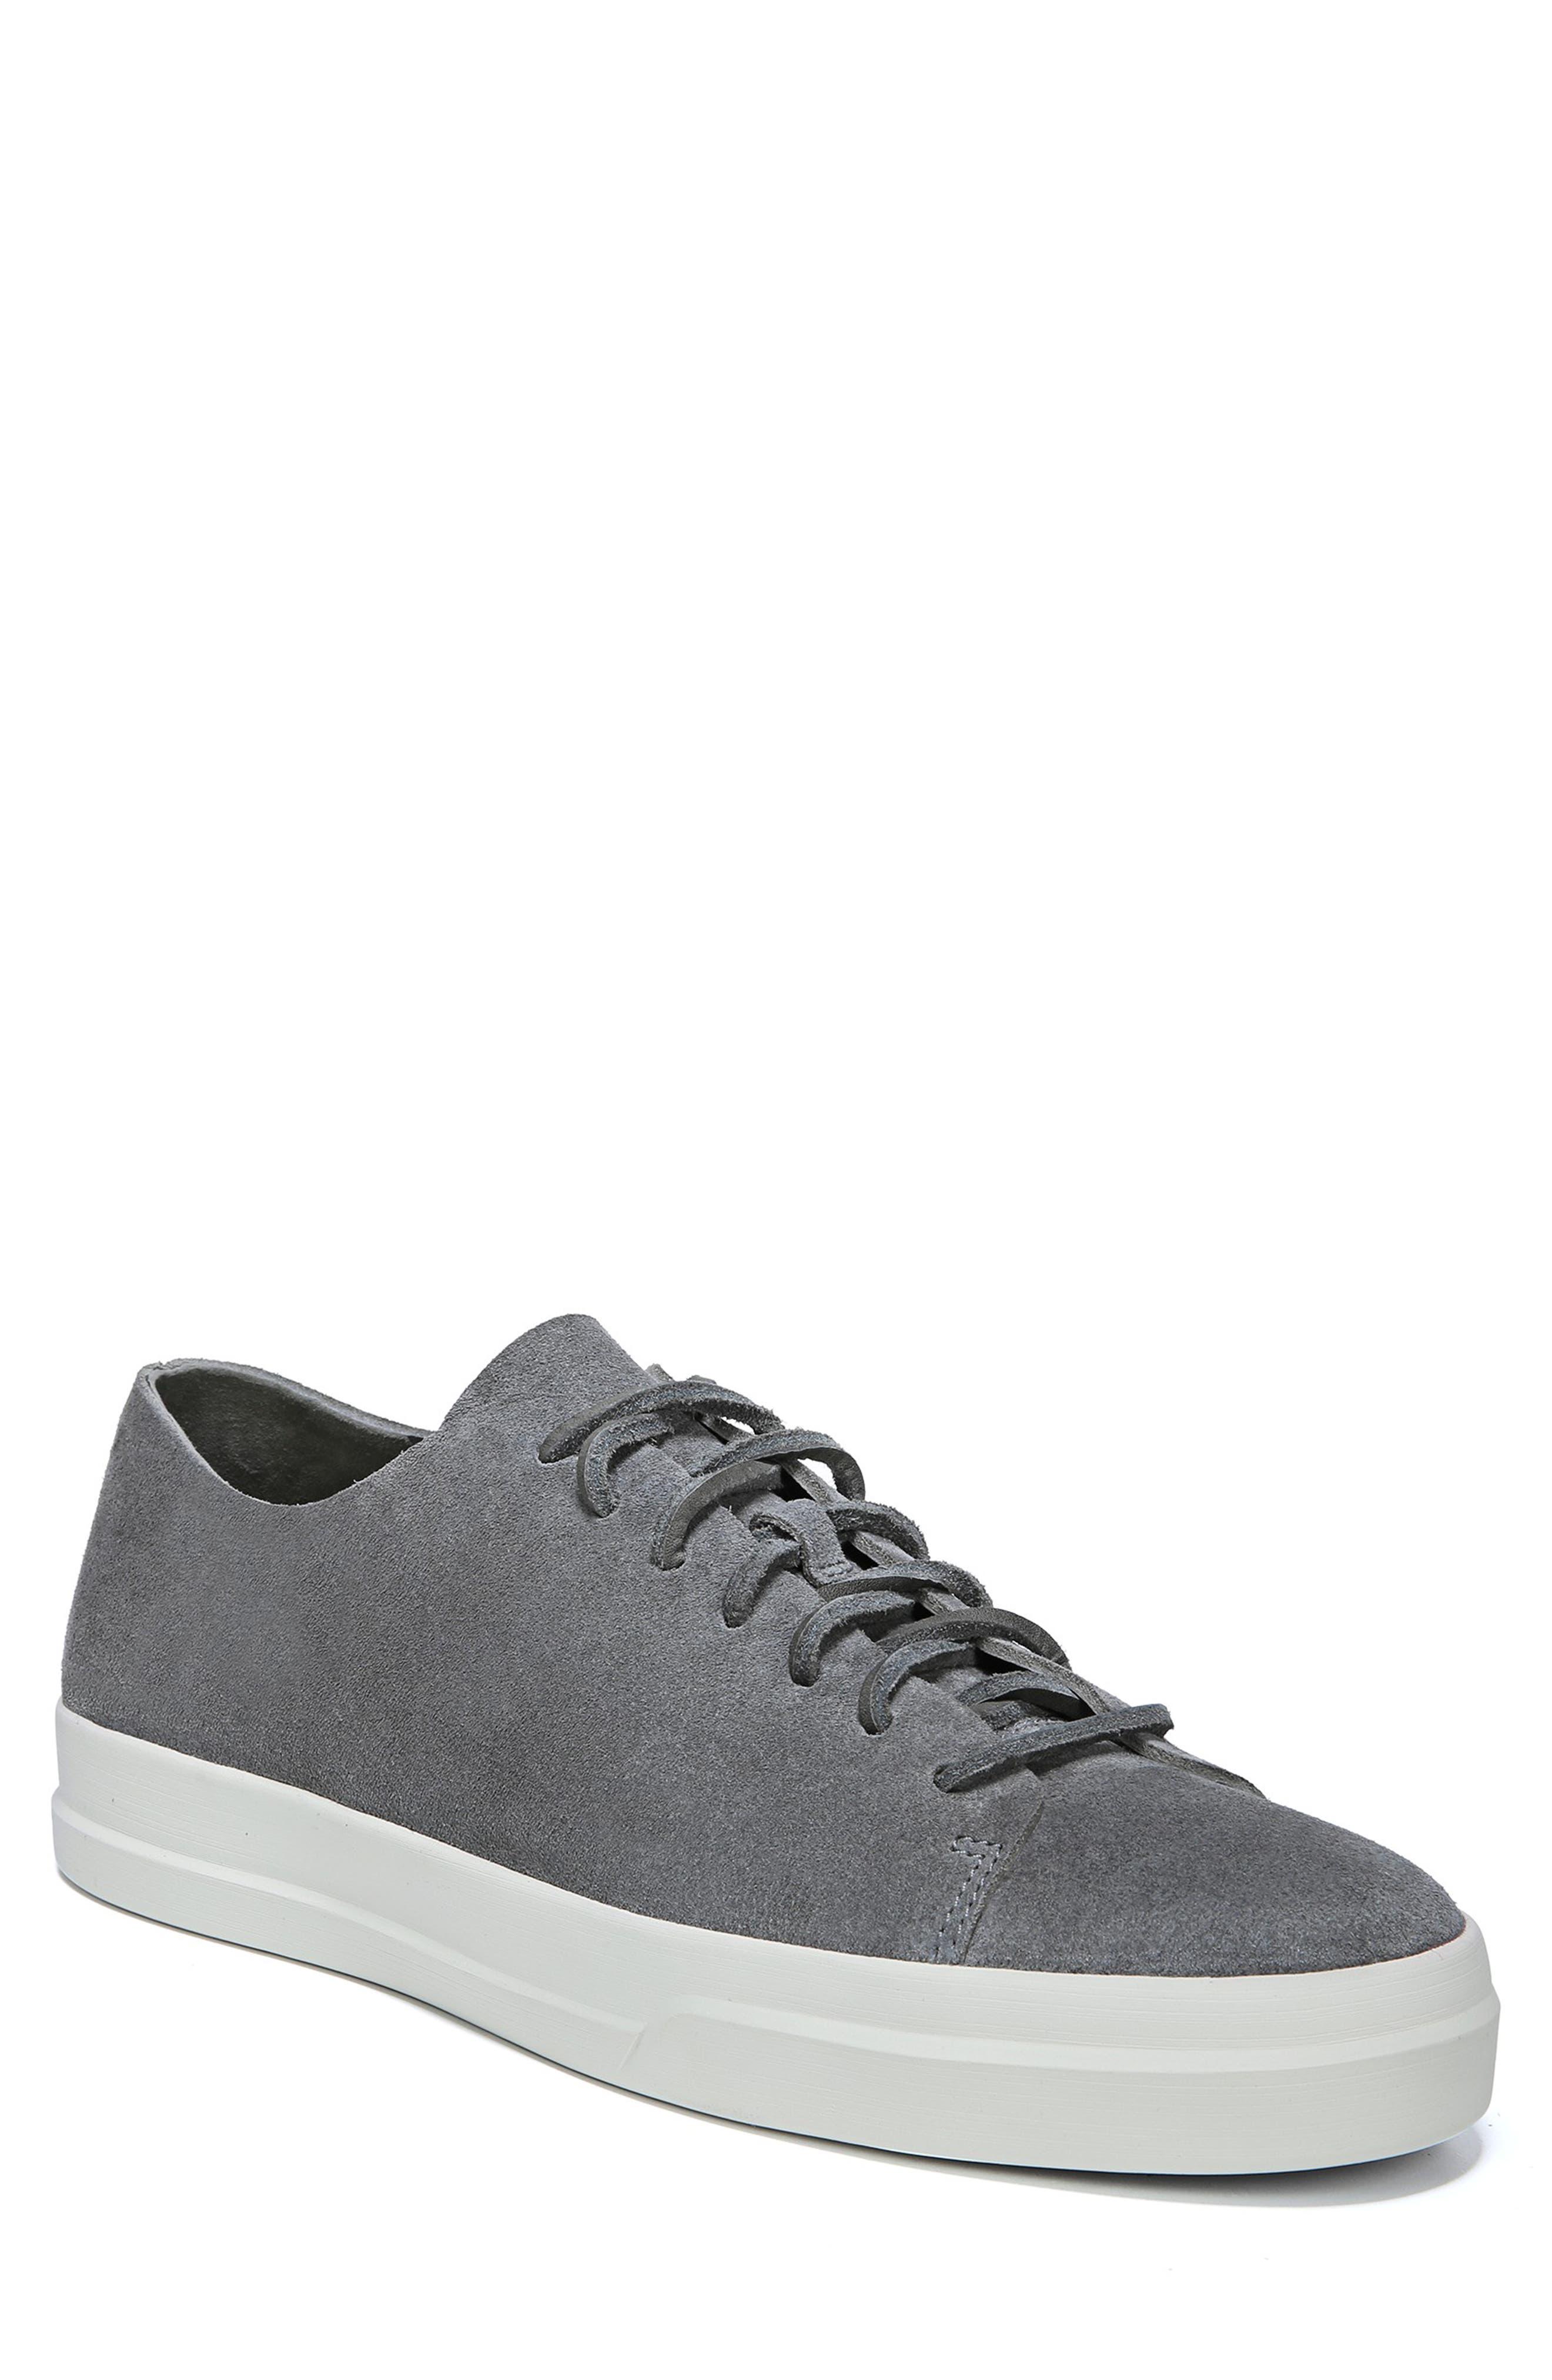 ,                             Copeland Sneaker,                             Main thumbnail 14, color,                             300